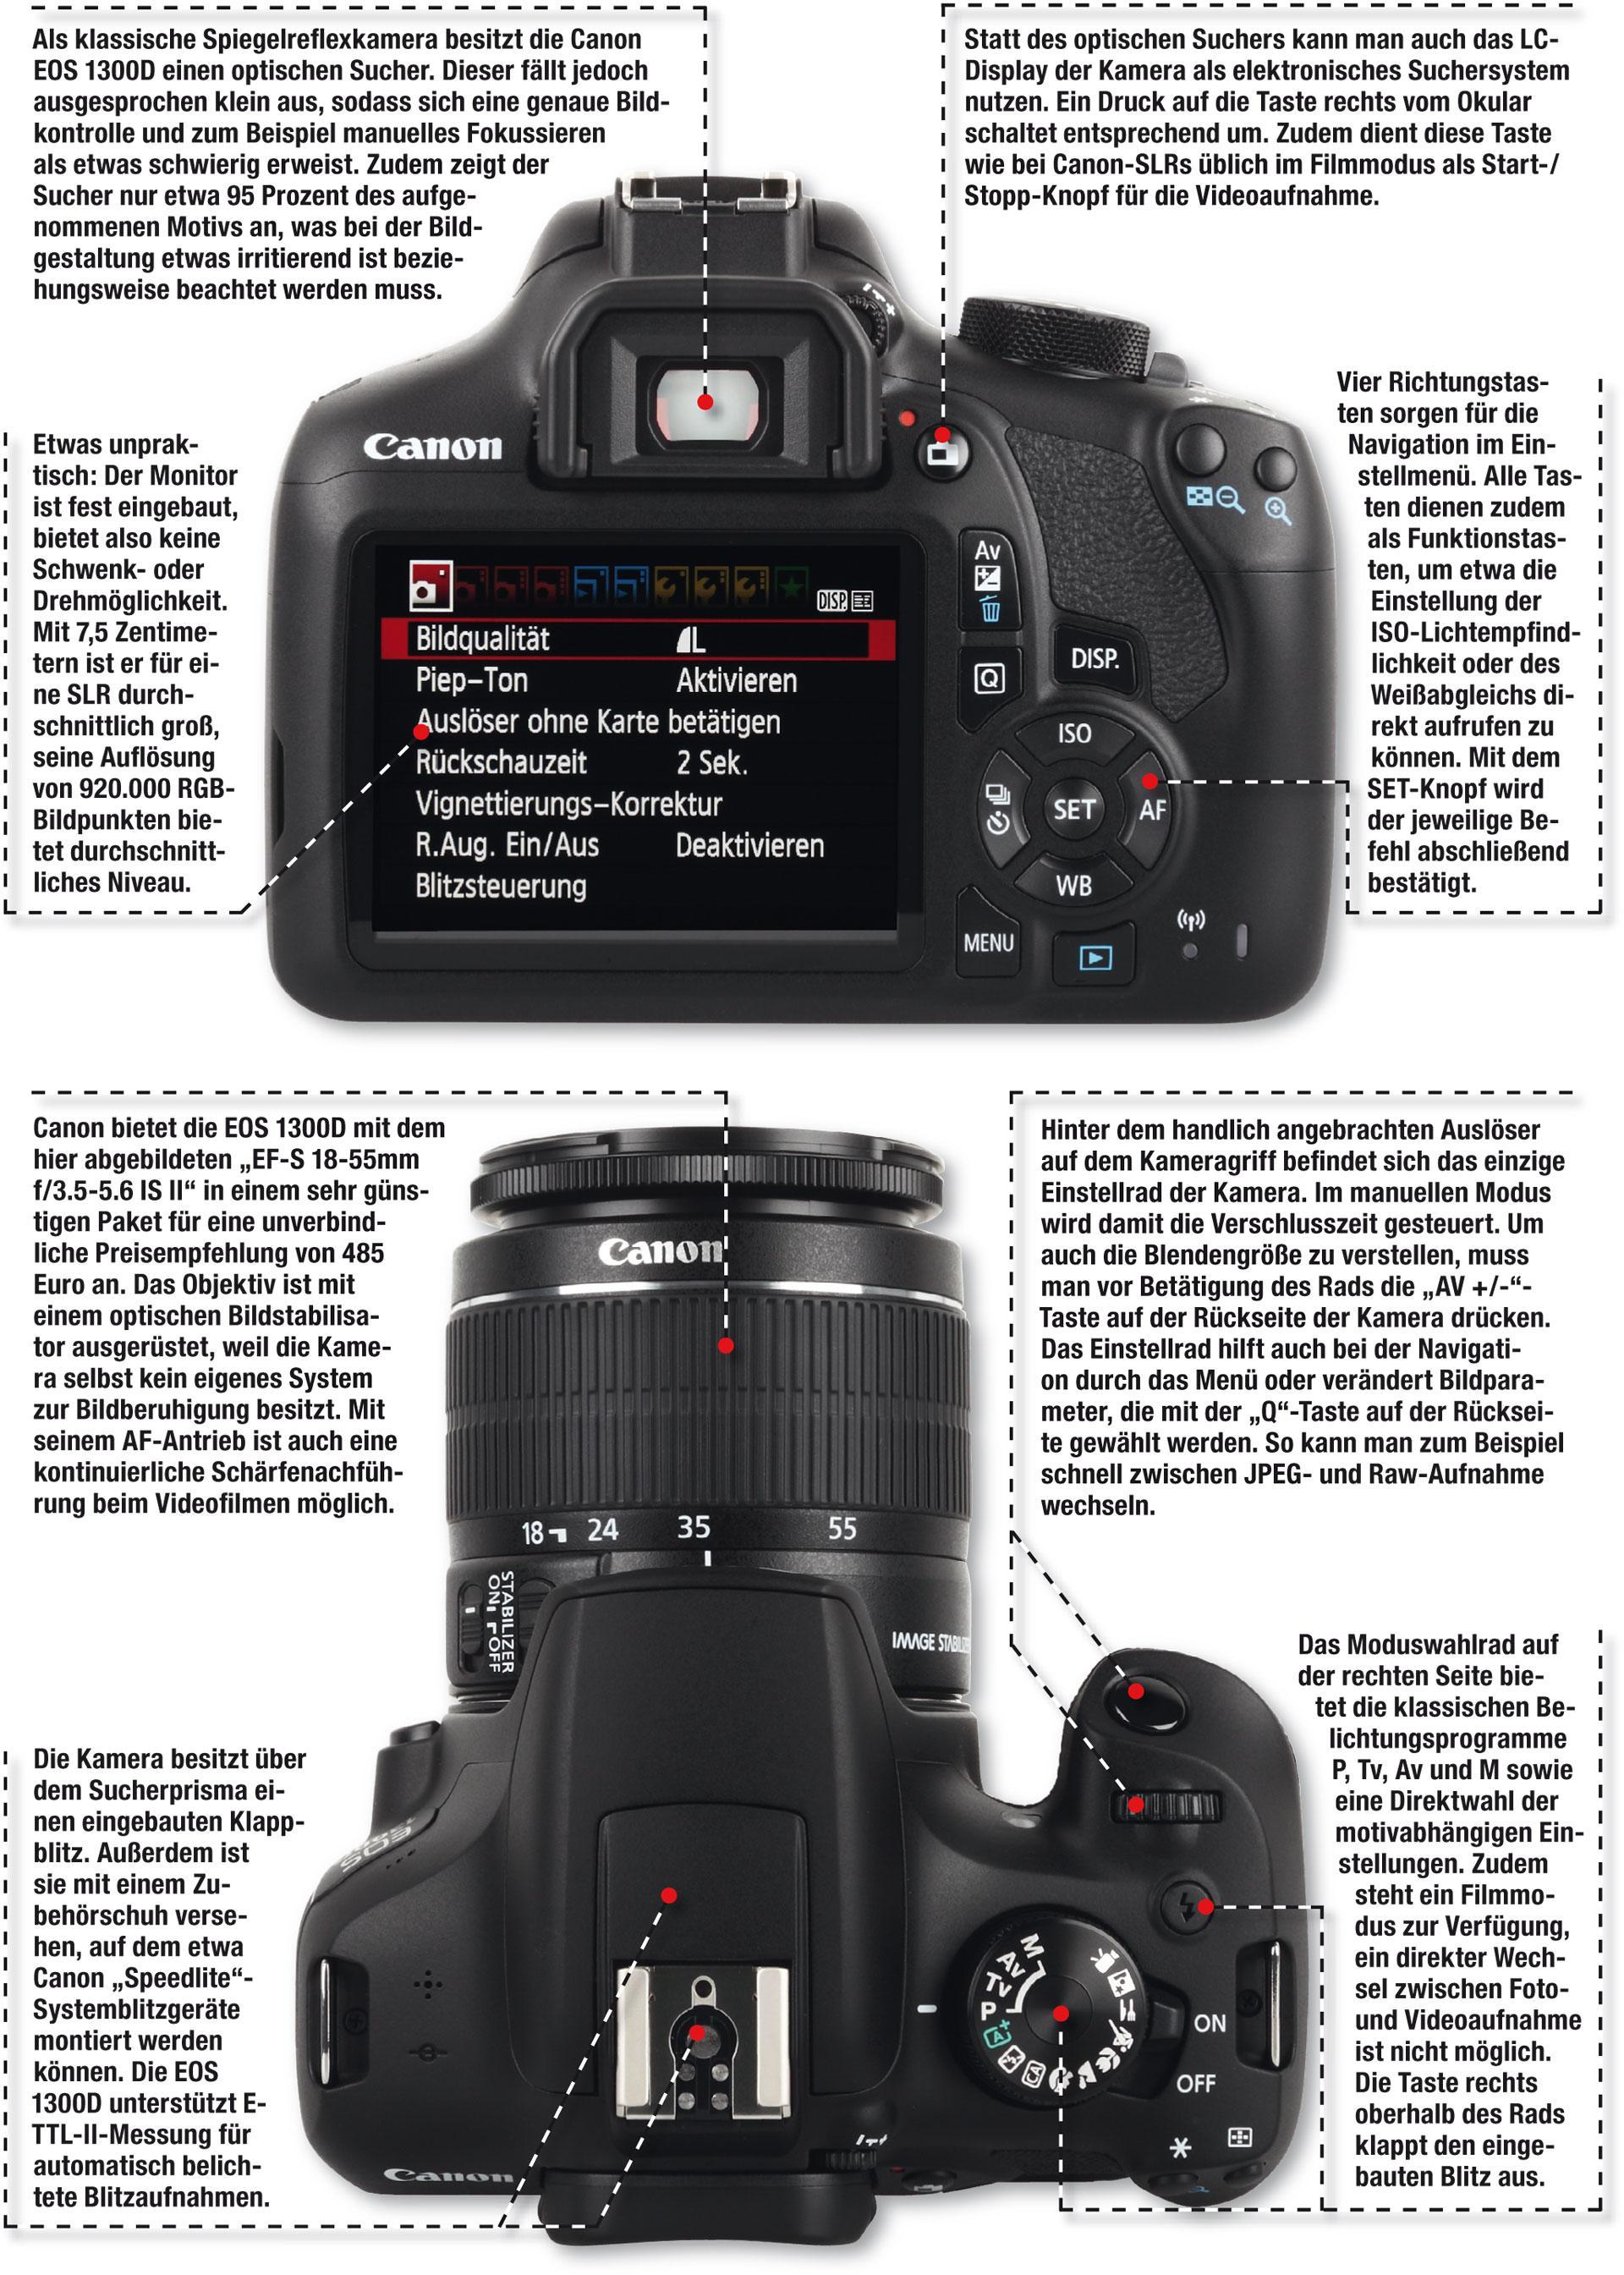 Kameratest Canon Eos 1300d Foto Hits Magazin Kamera 18 55 Iii Aufbau